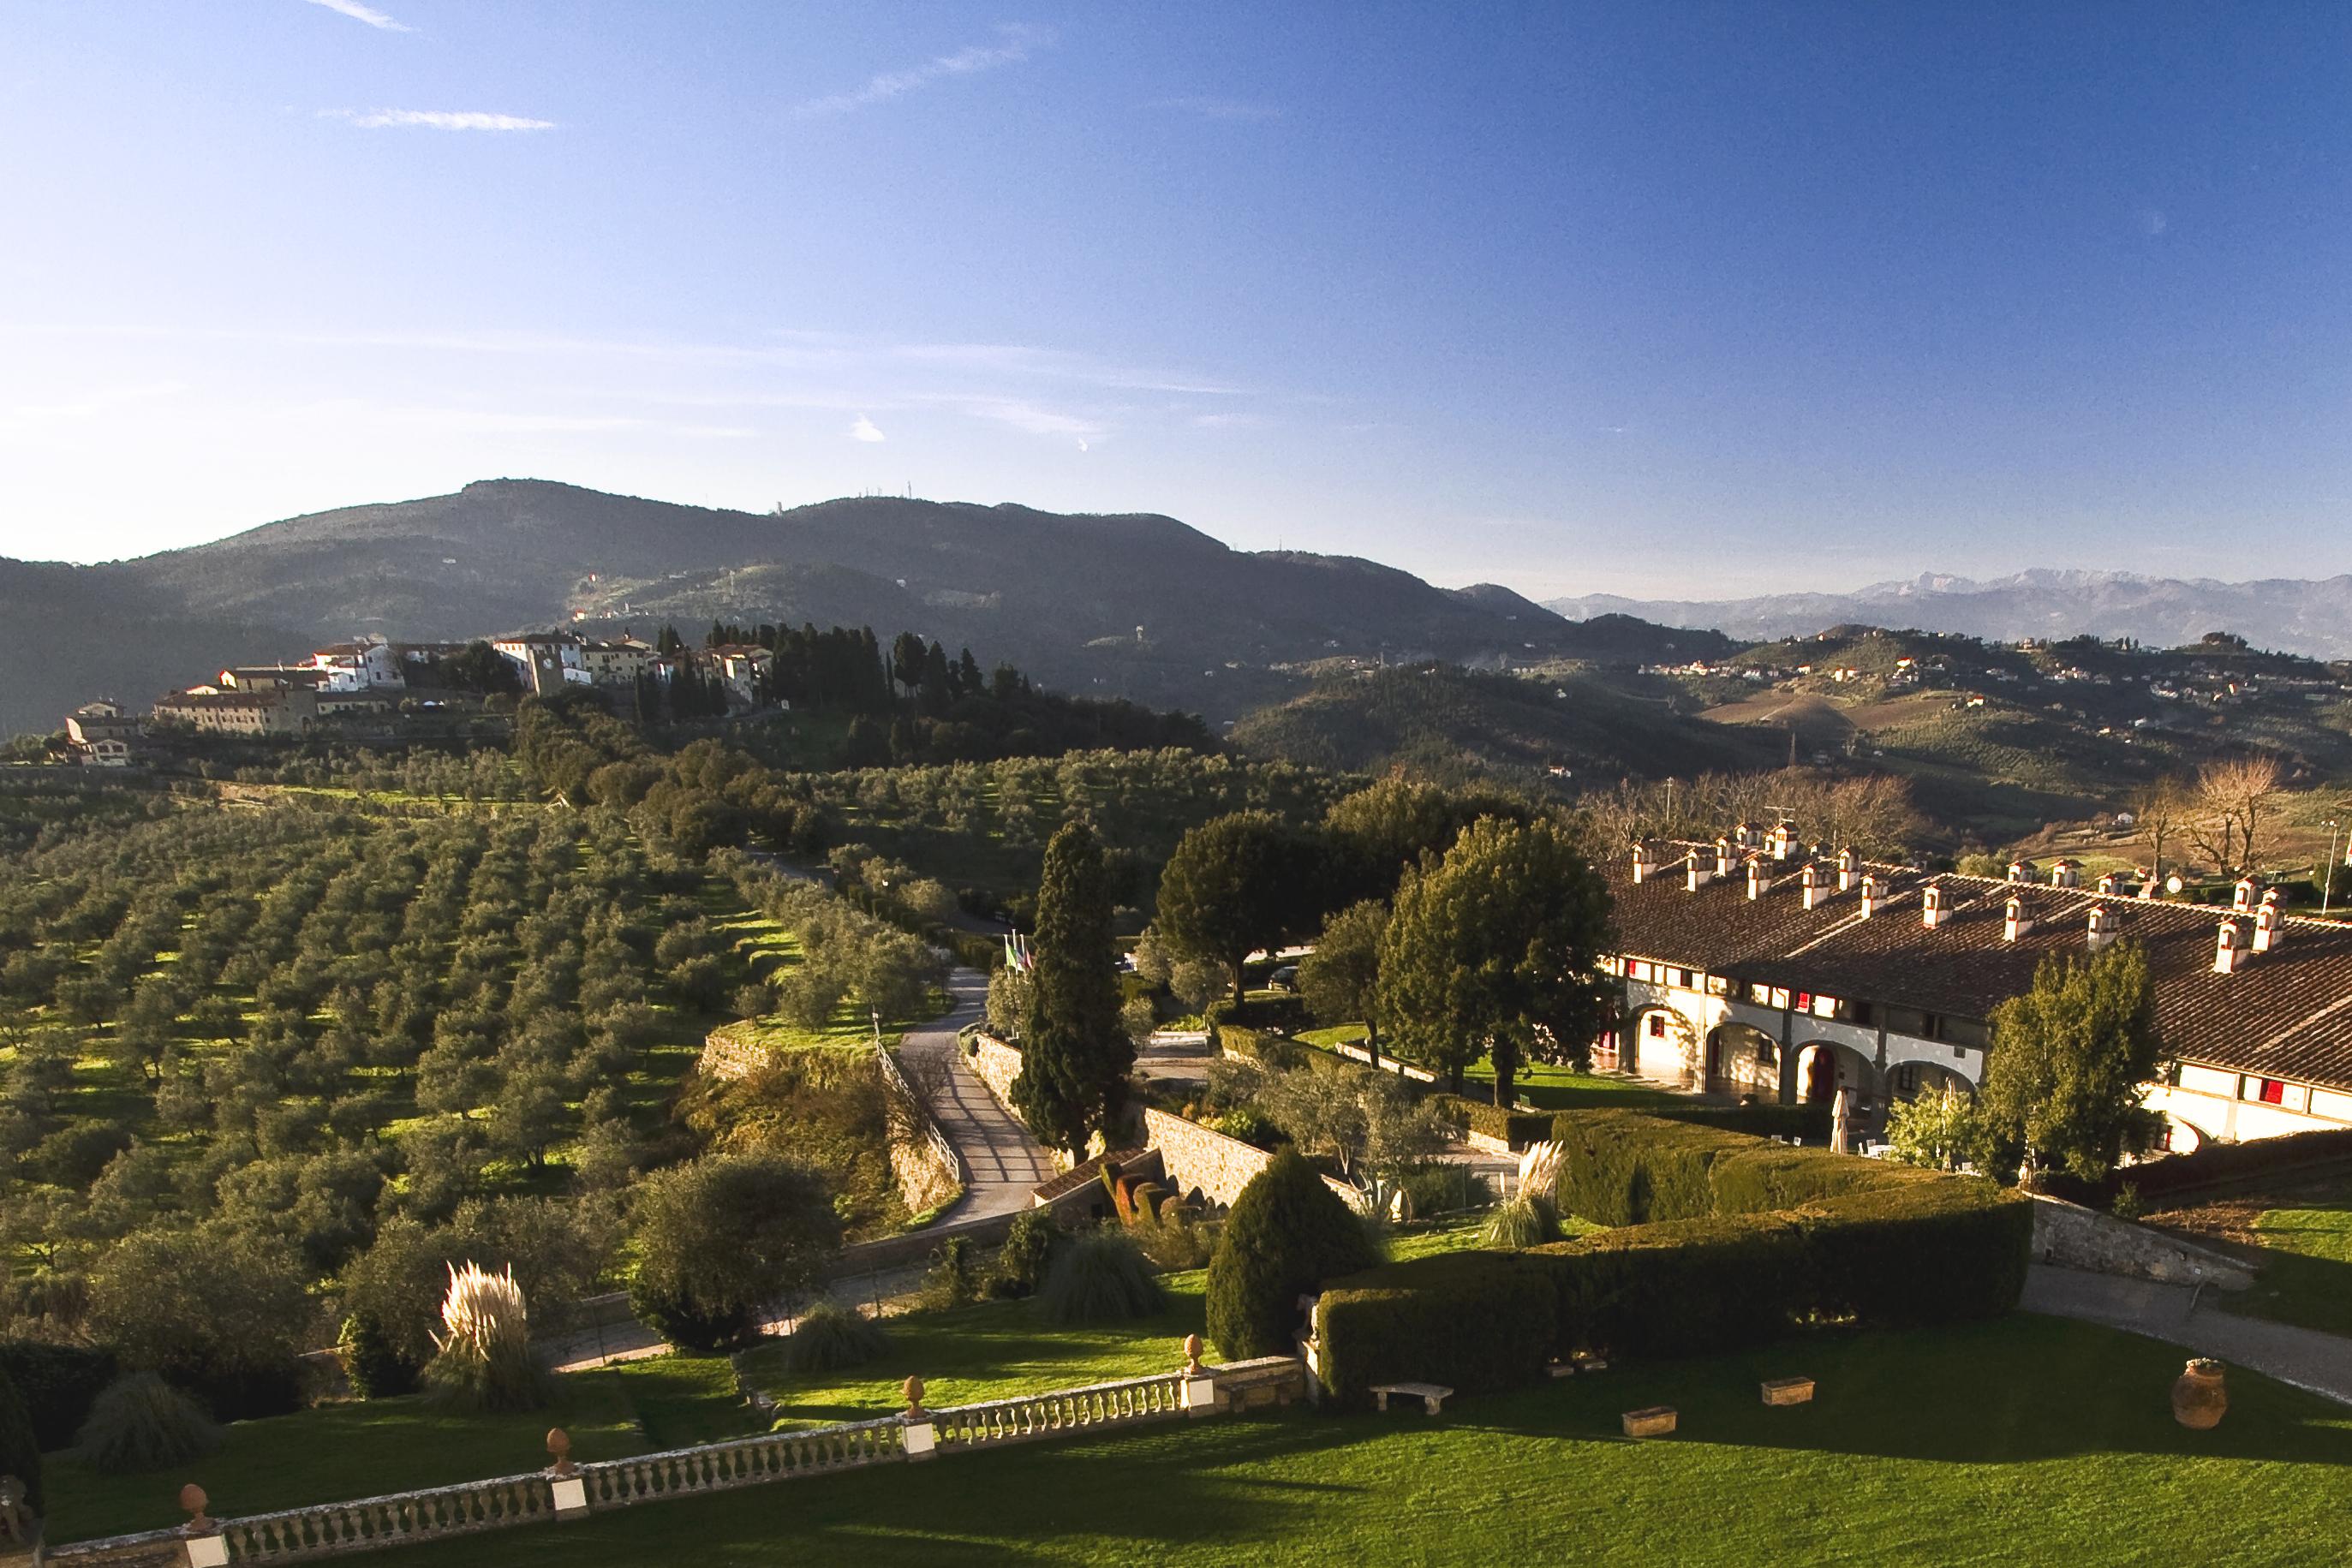 Esterno-Hotel Paggeria Medicea-Artimino-Prato